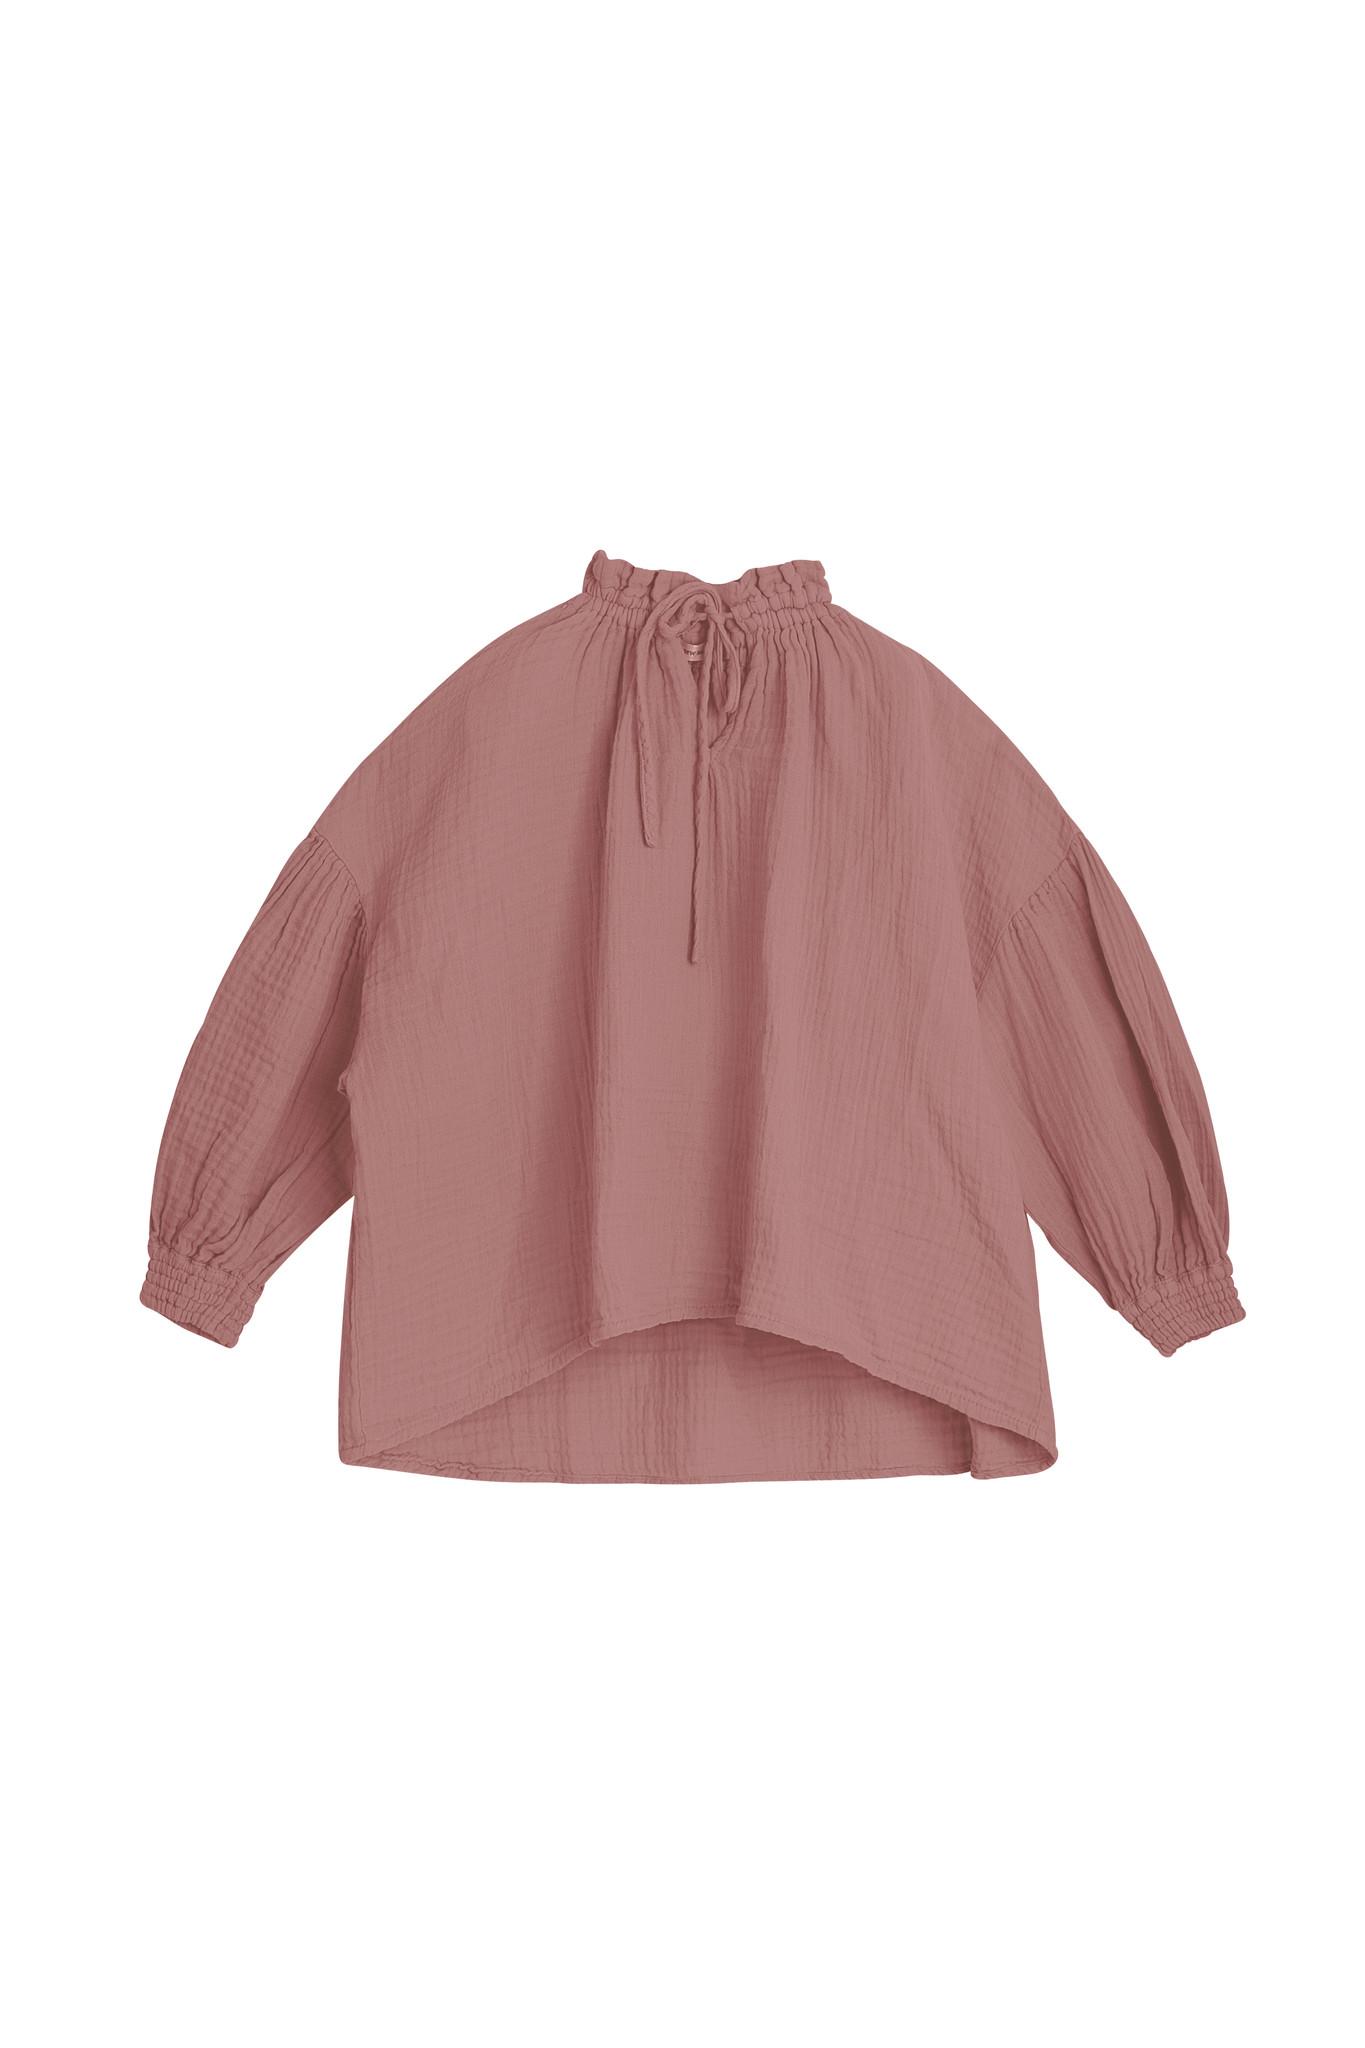 Olivia blouse - Rose Taupe-2